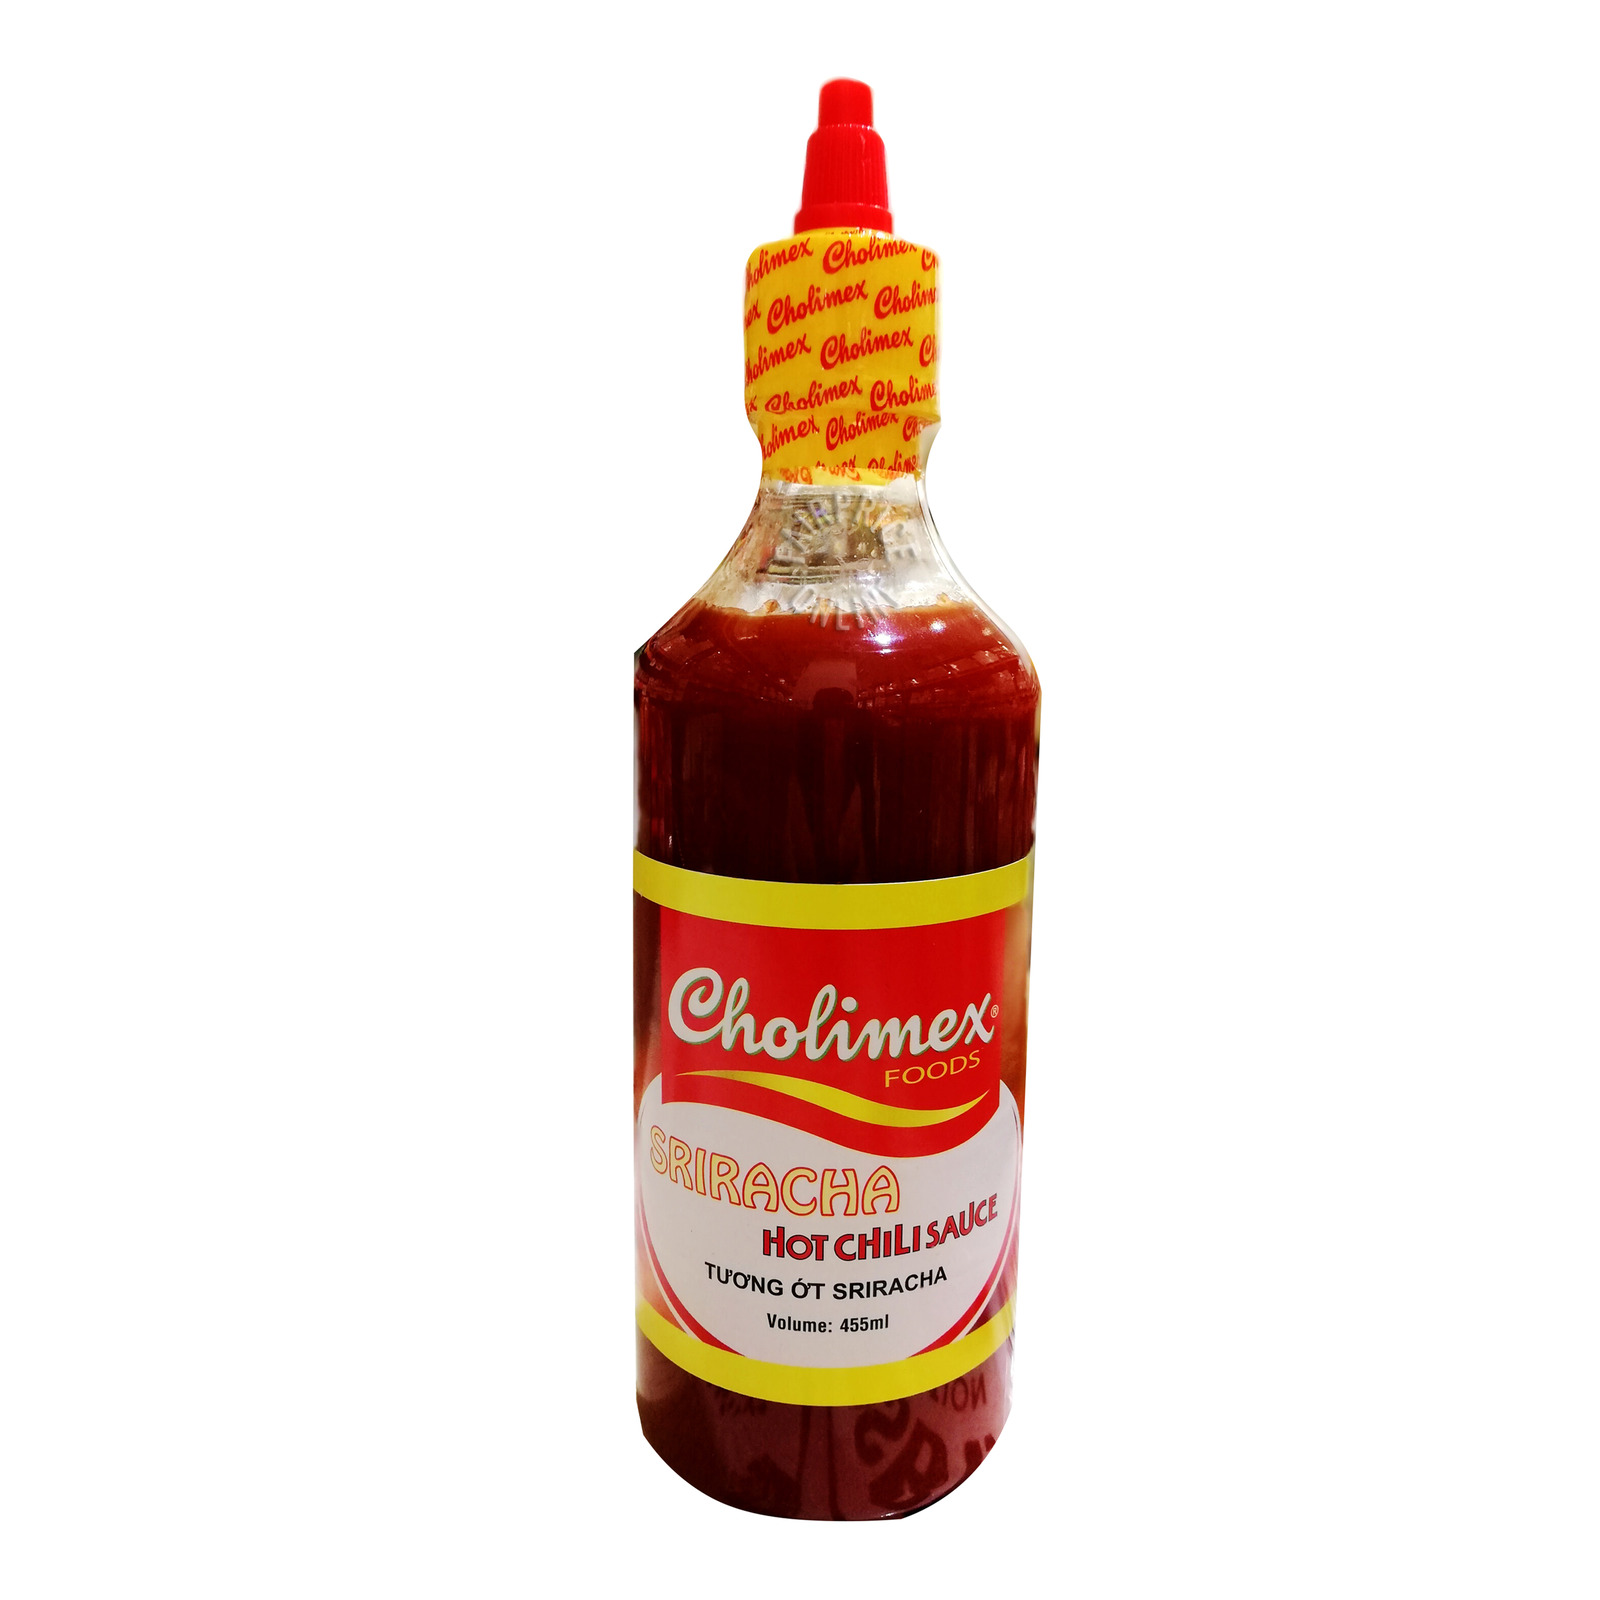 Cholimex Sriracha Chili Sauce